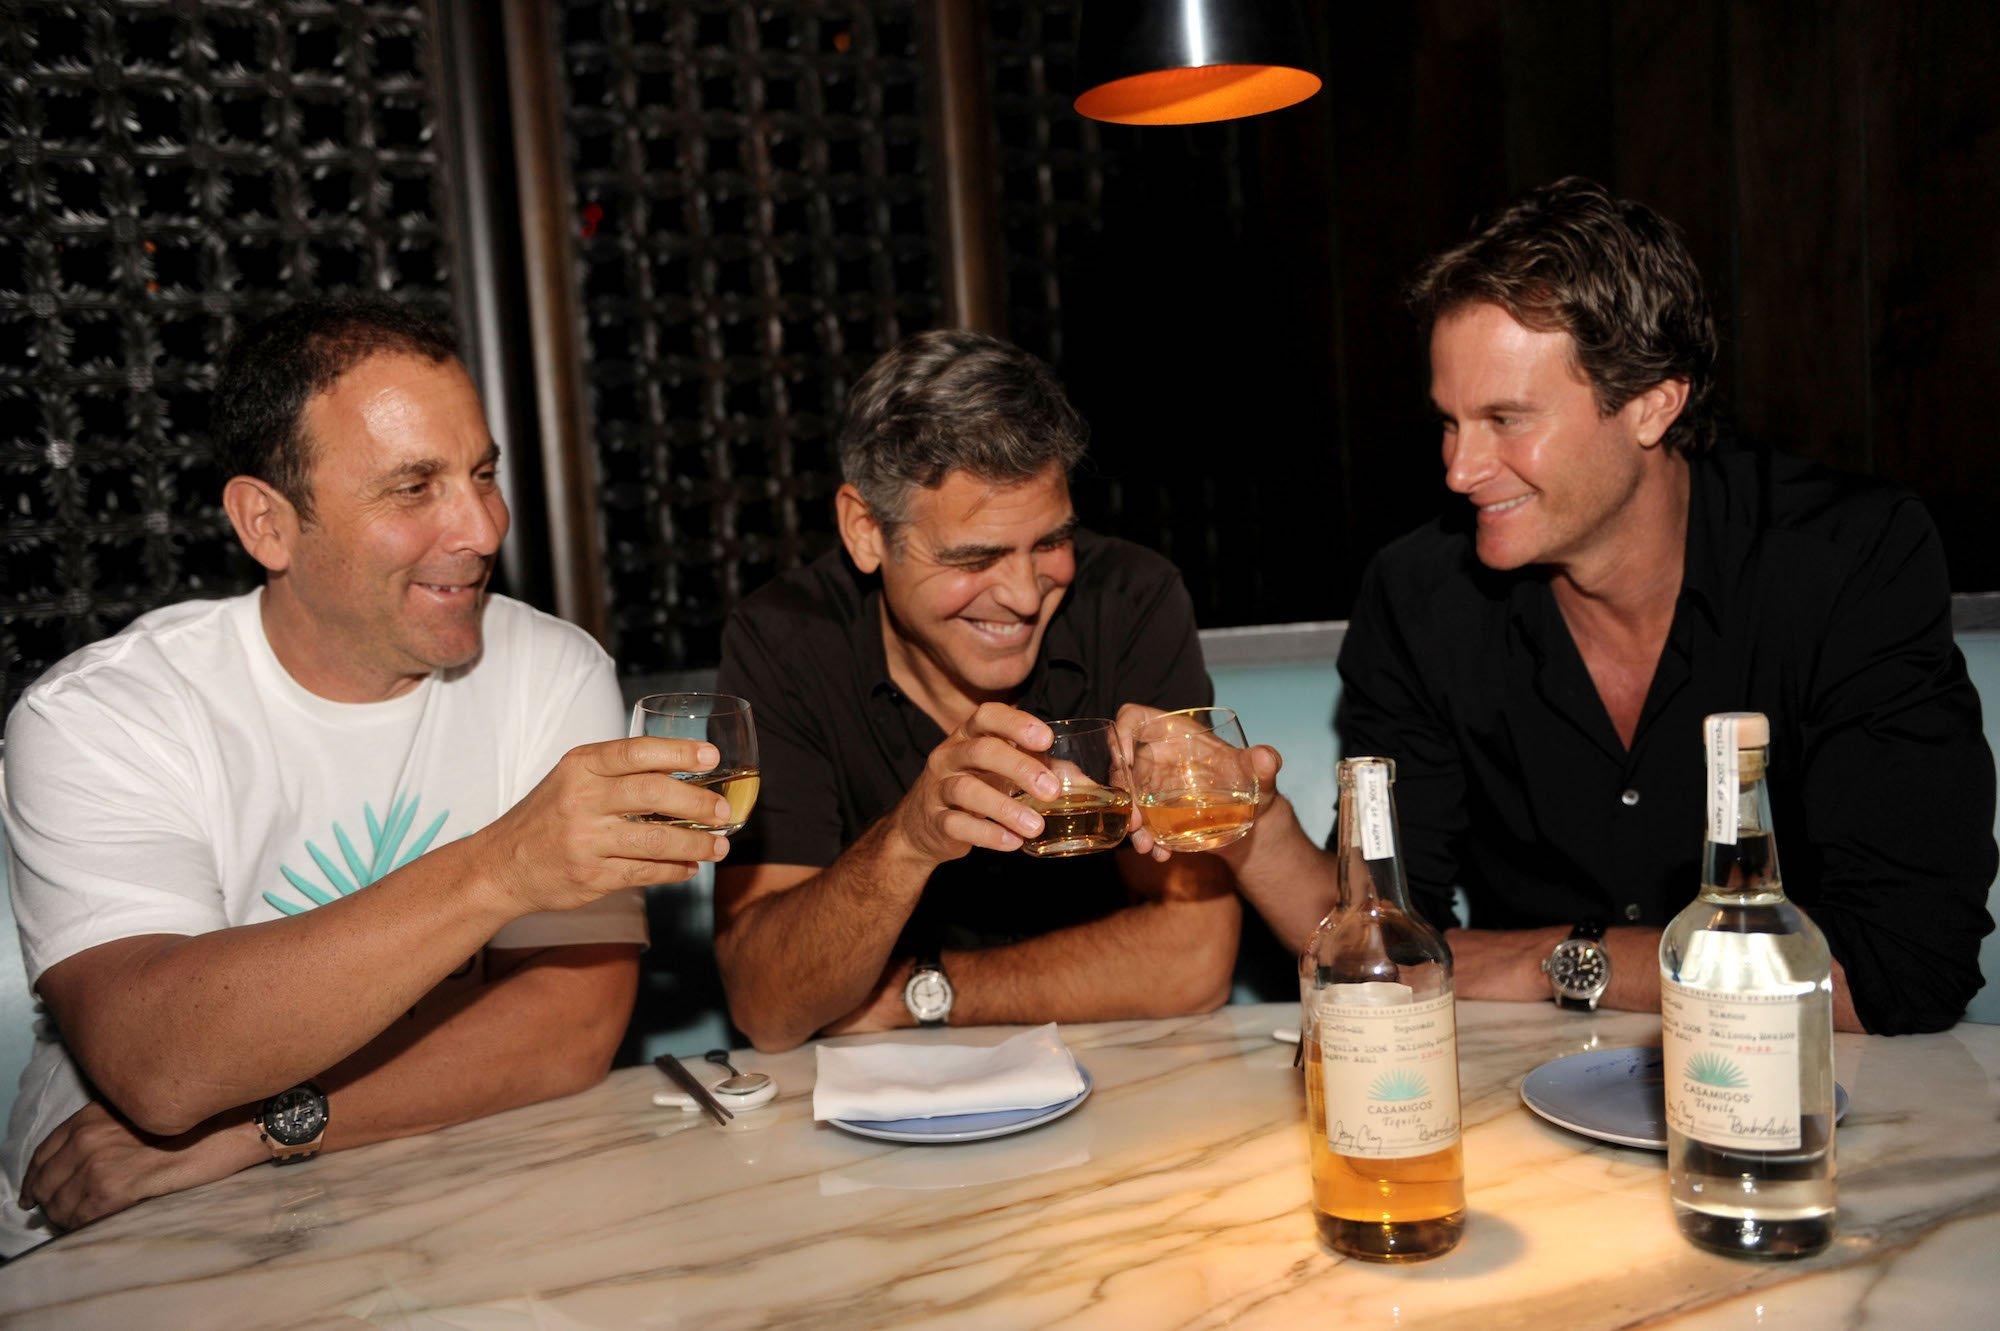 Zakladatelé společnosti Casamigos (zleva: Mike Meldman, George Clooney a Rande Gerber)